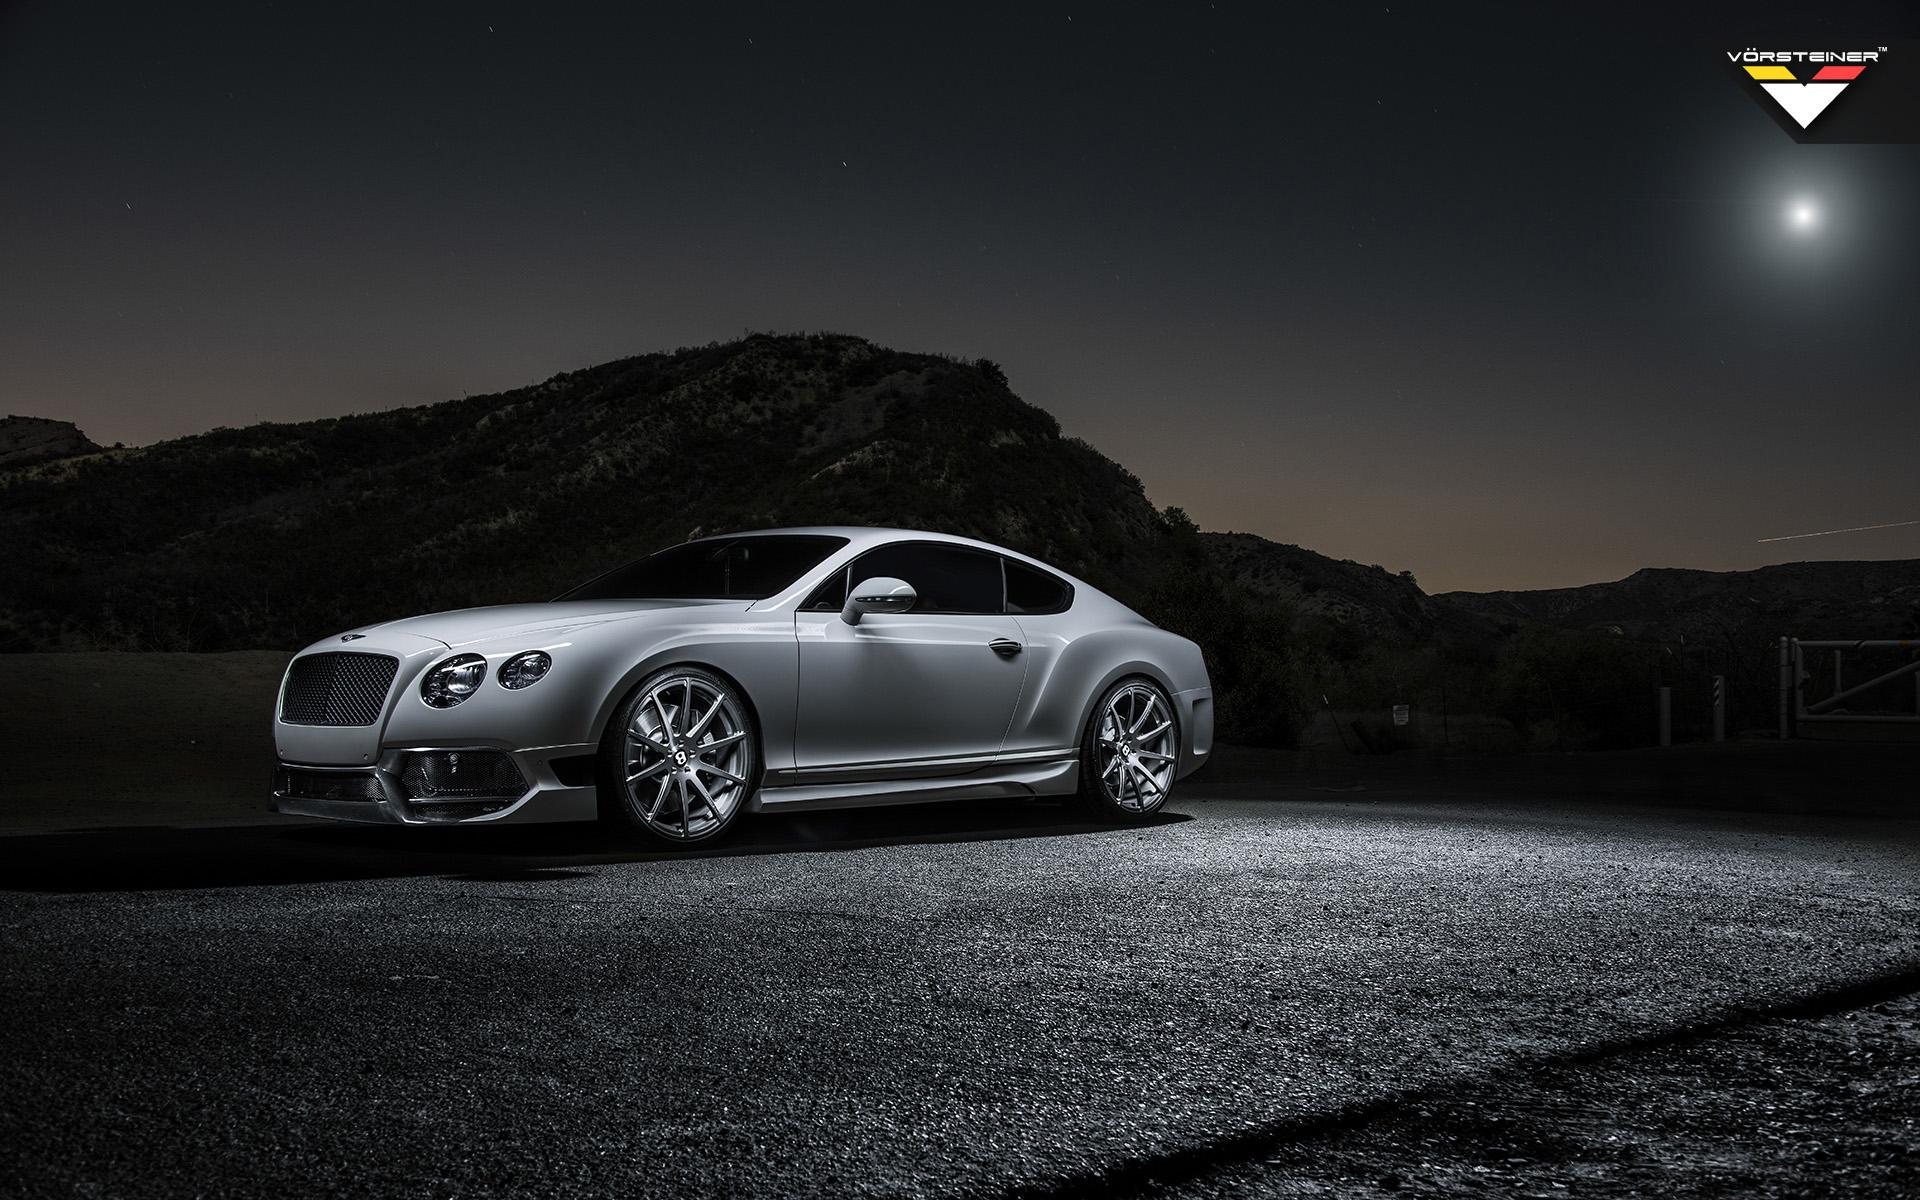 2013 Vorsteiner Bentley Continental GT BR10 RS Wallpaper   HD Car ...